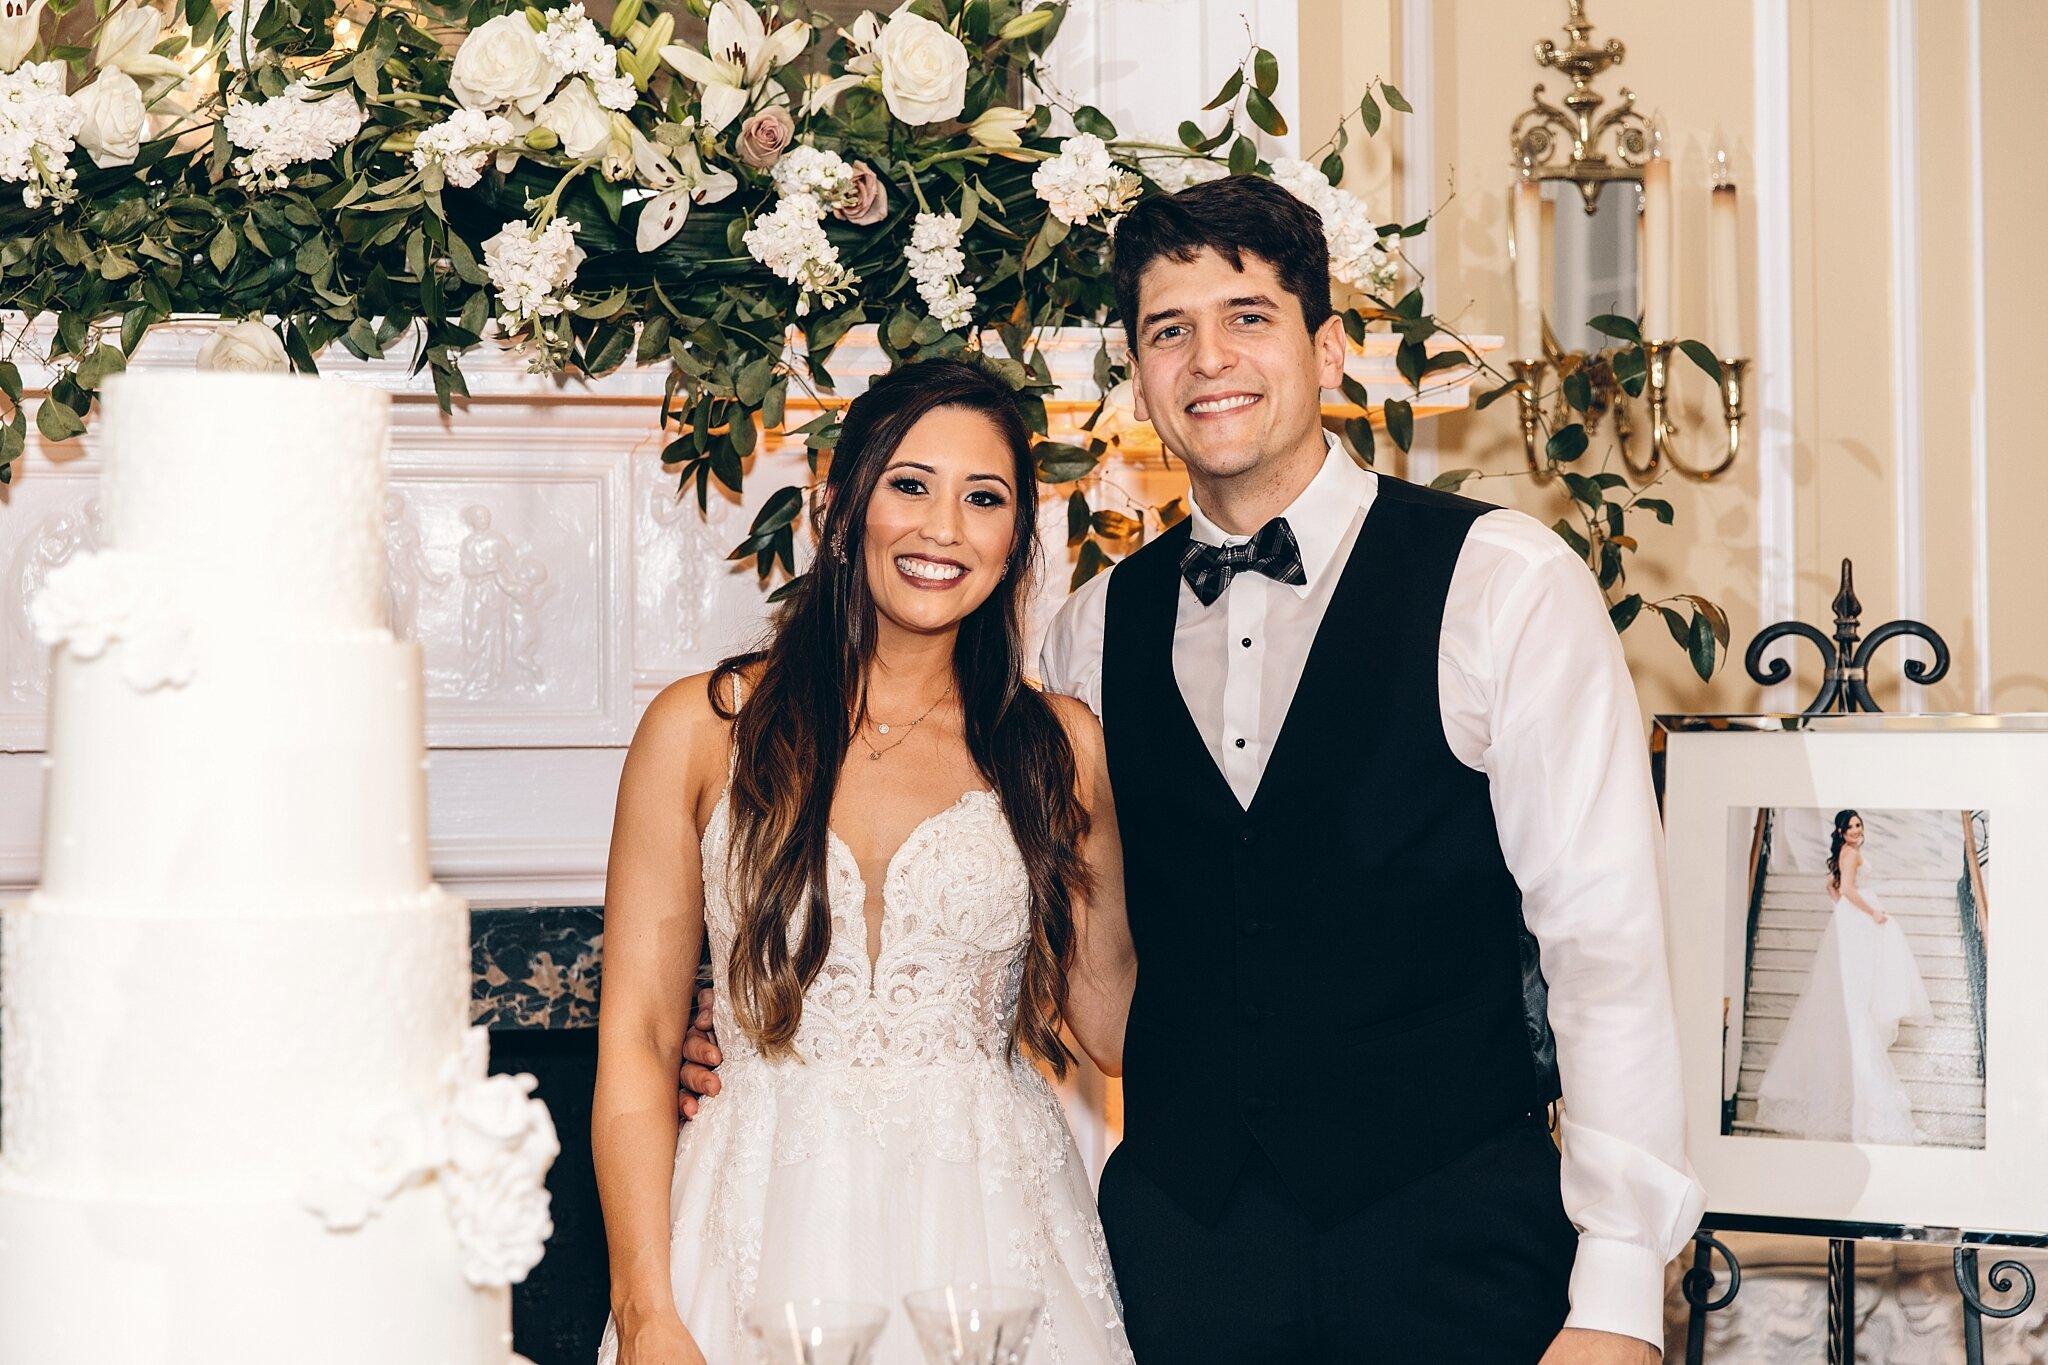 patrick-henry-ballroom-wedding-roanoke_0551.jpg